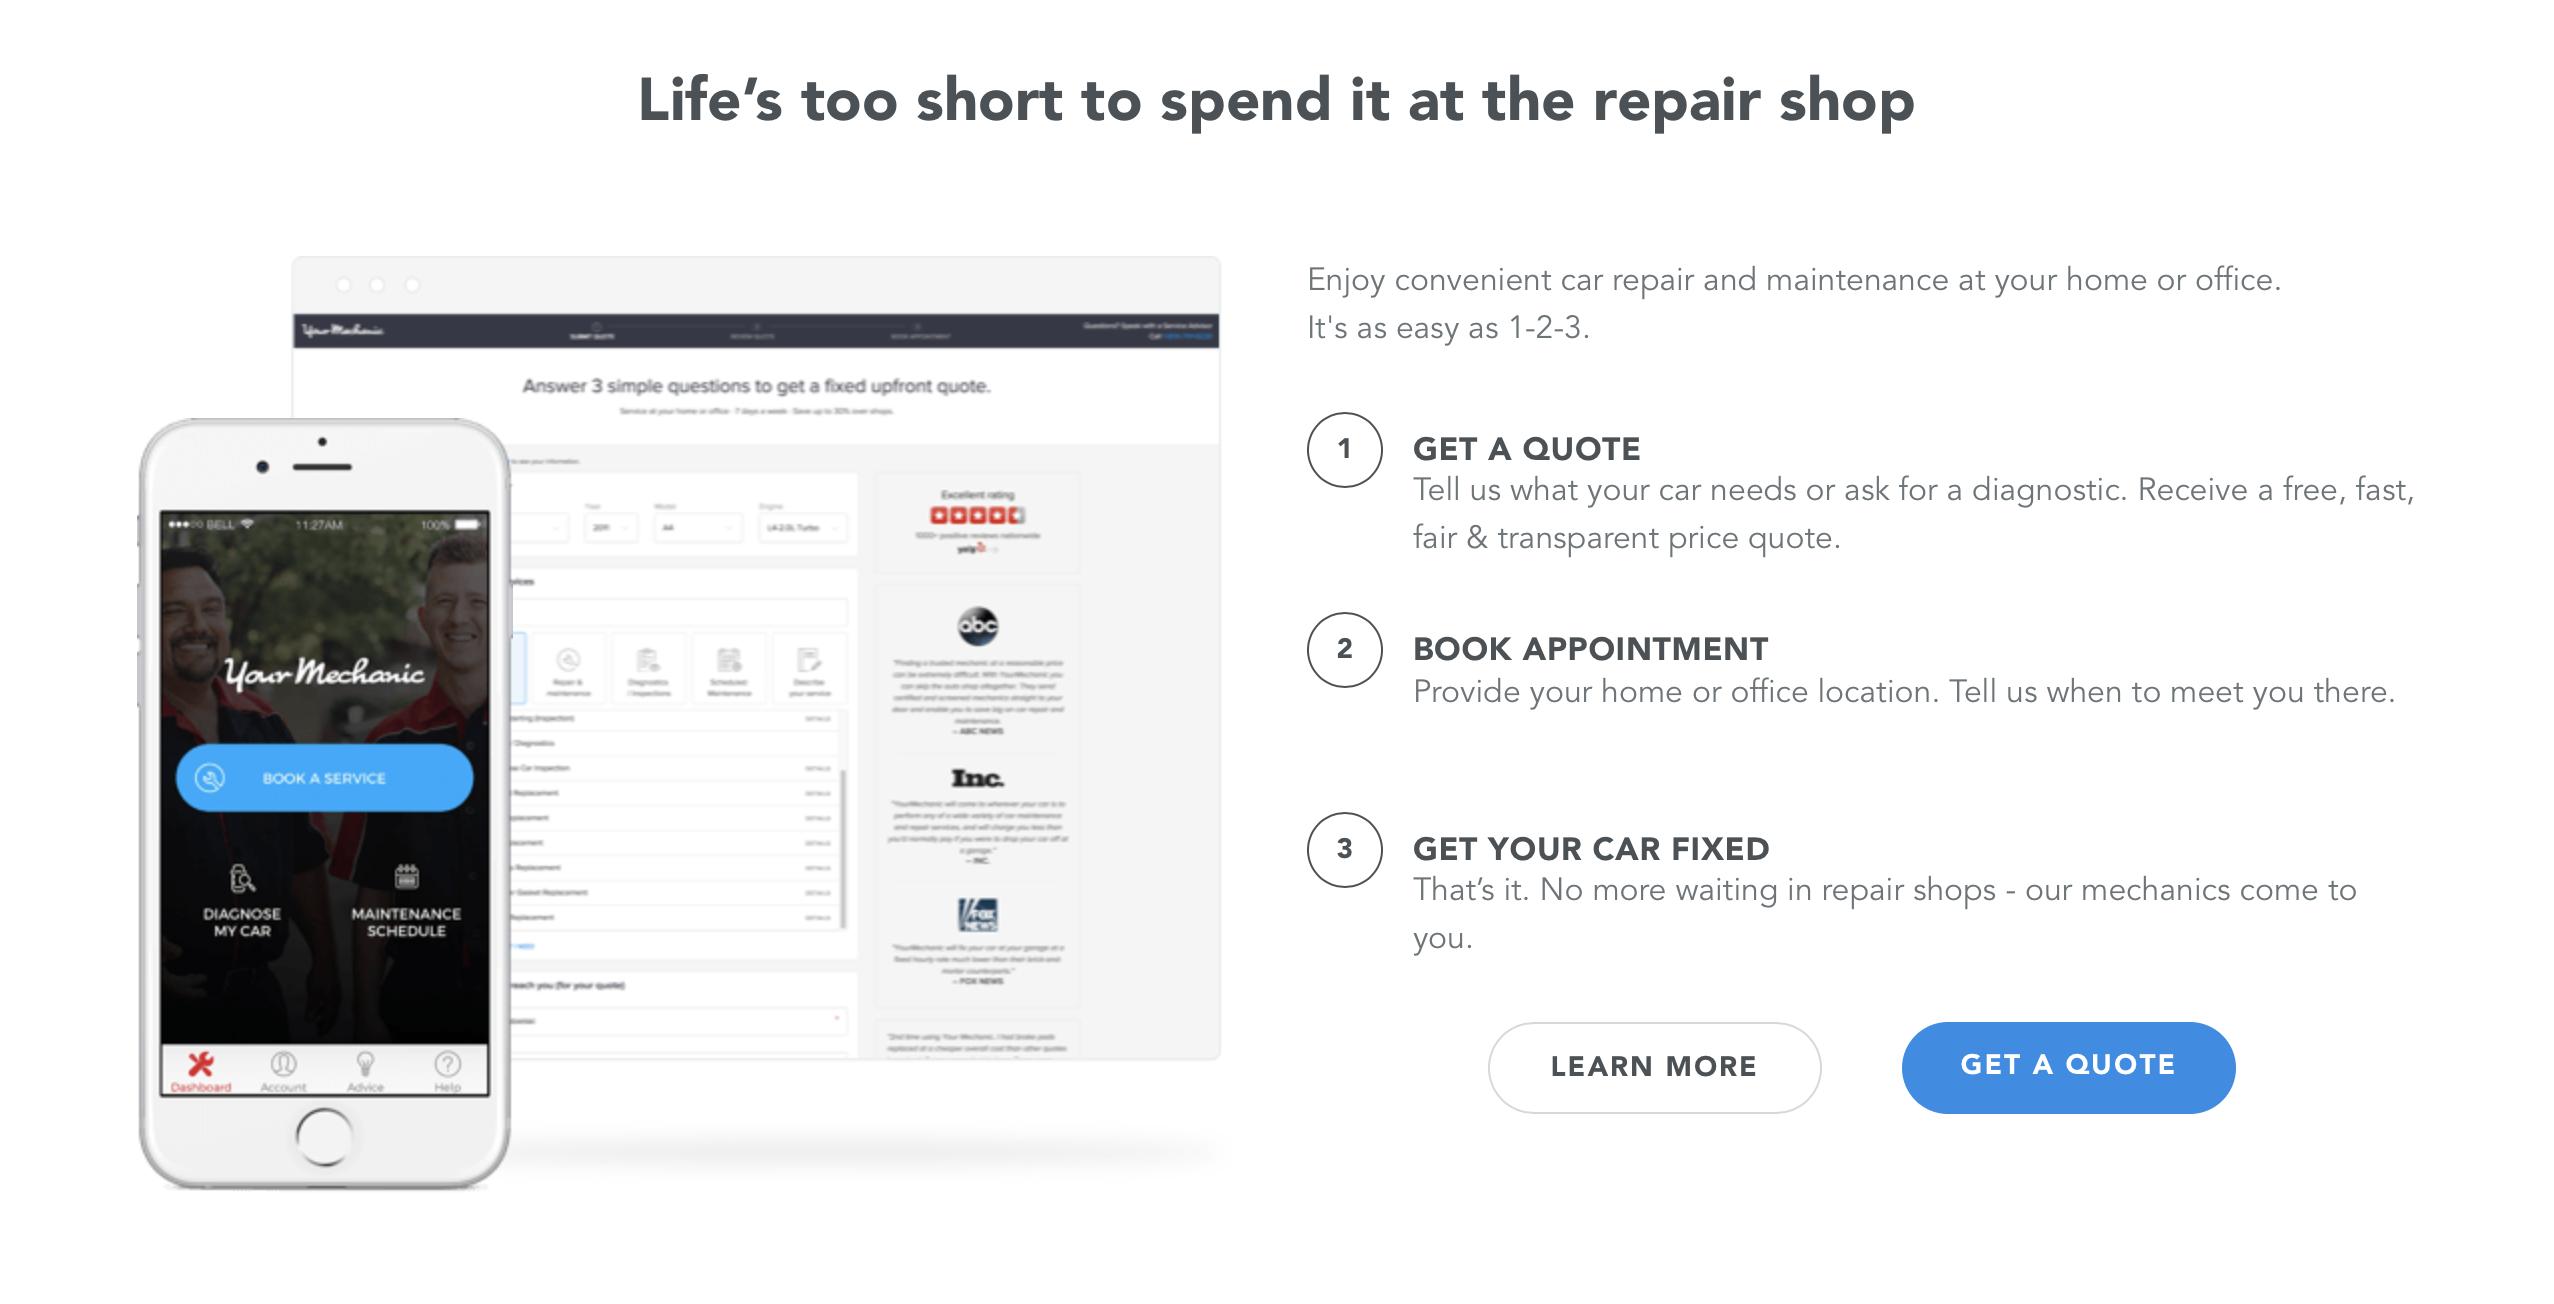 How does YourMechanic.com work?